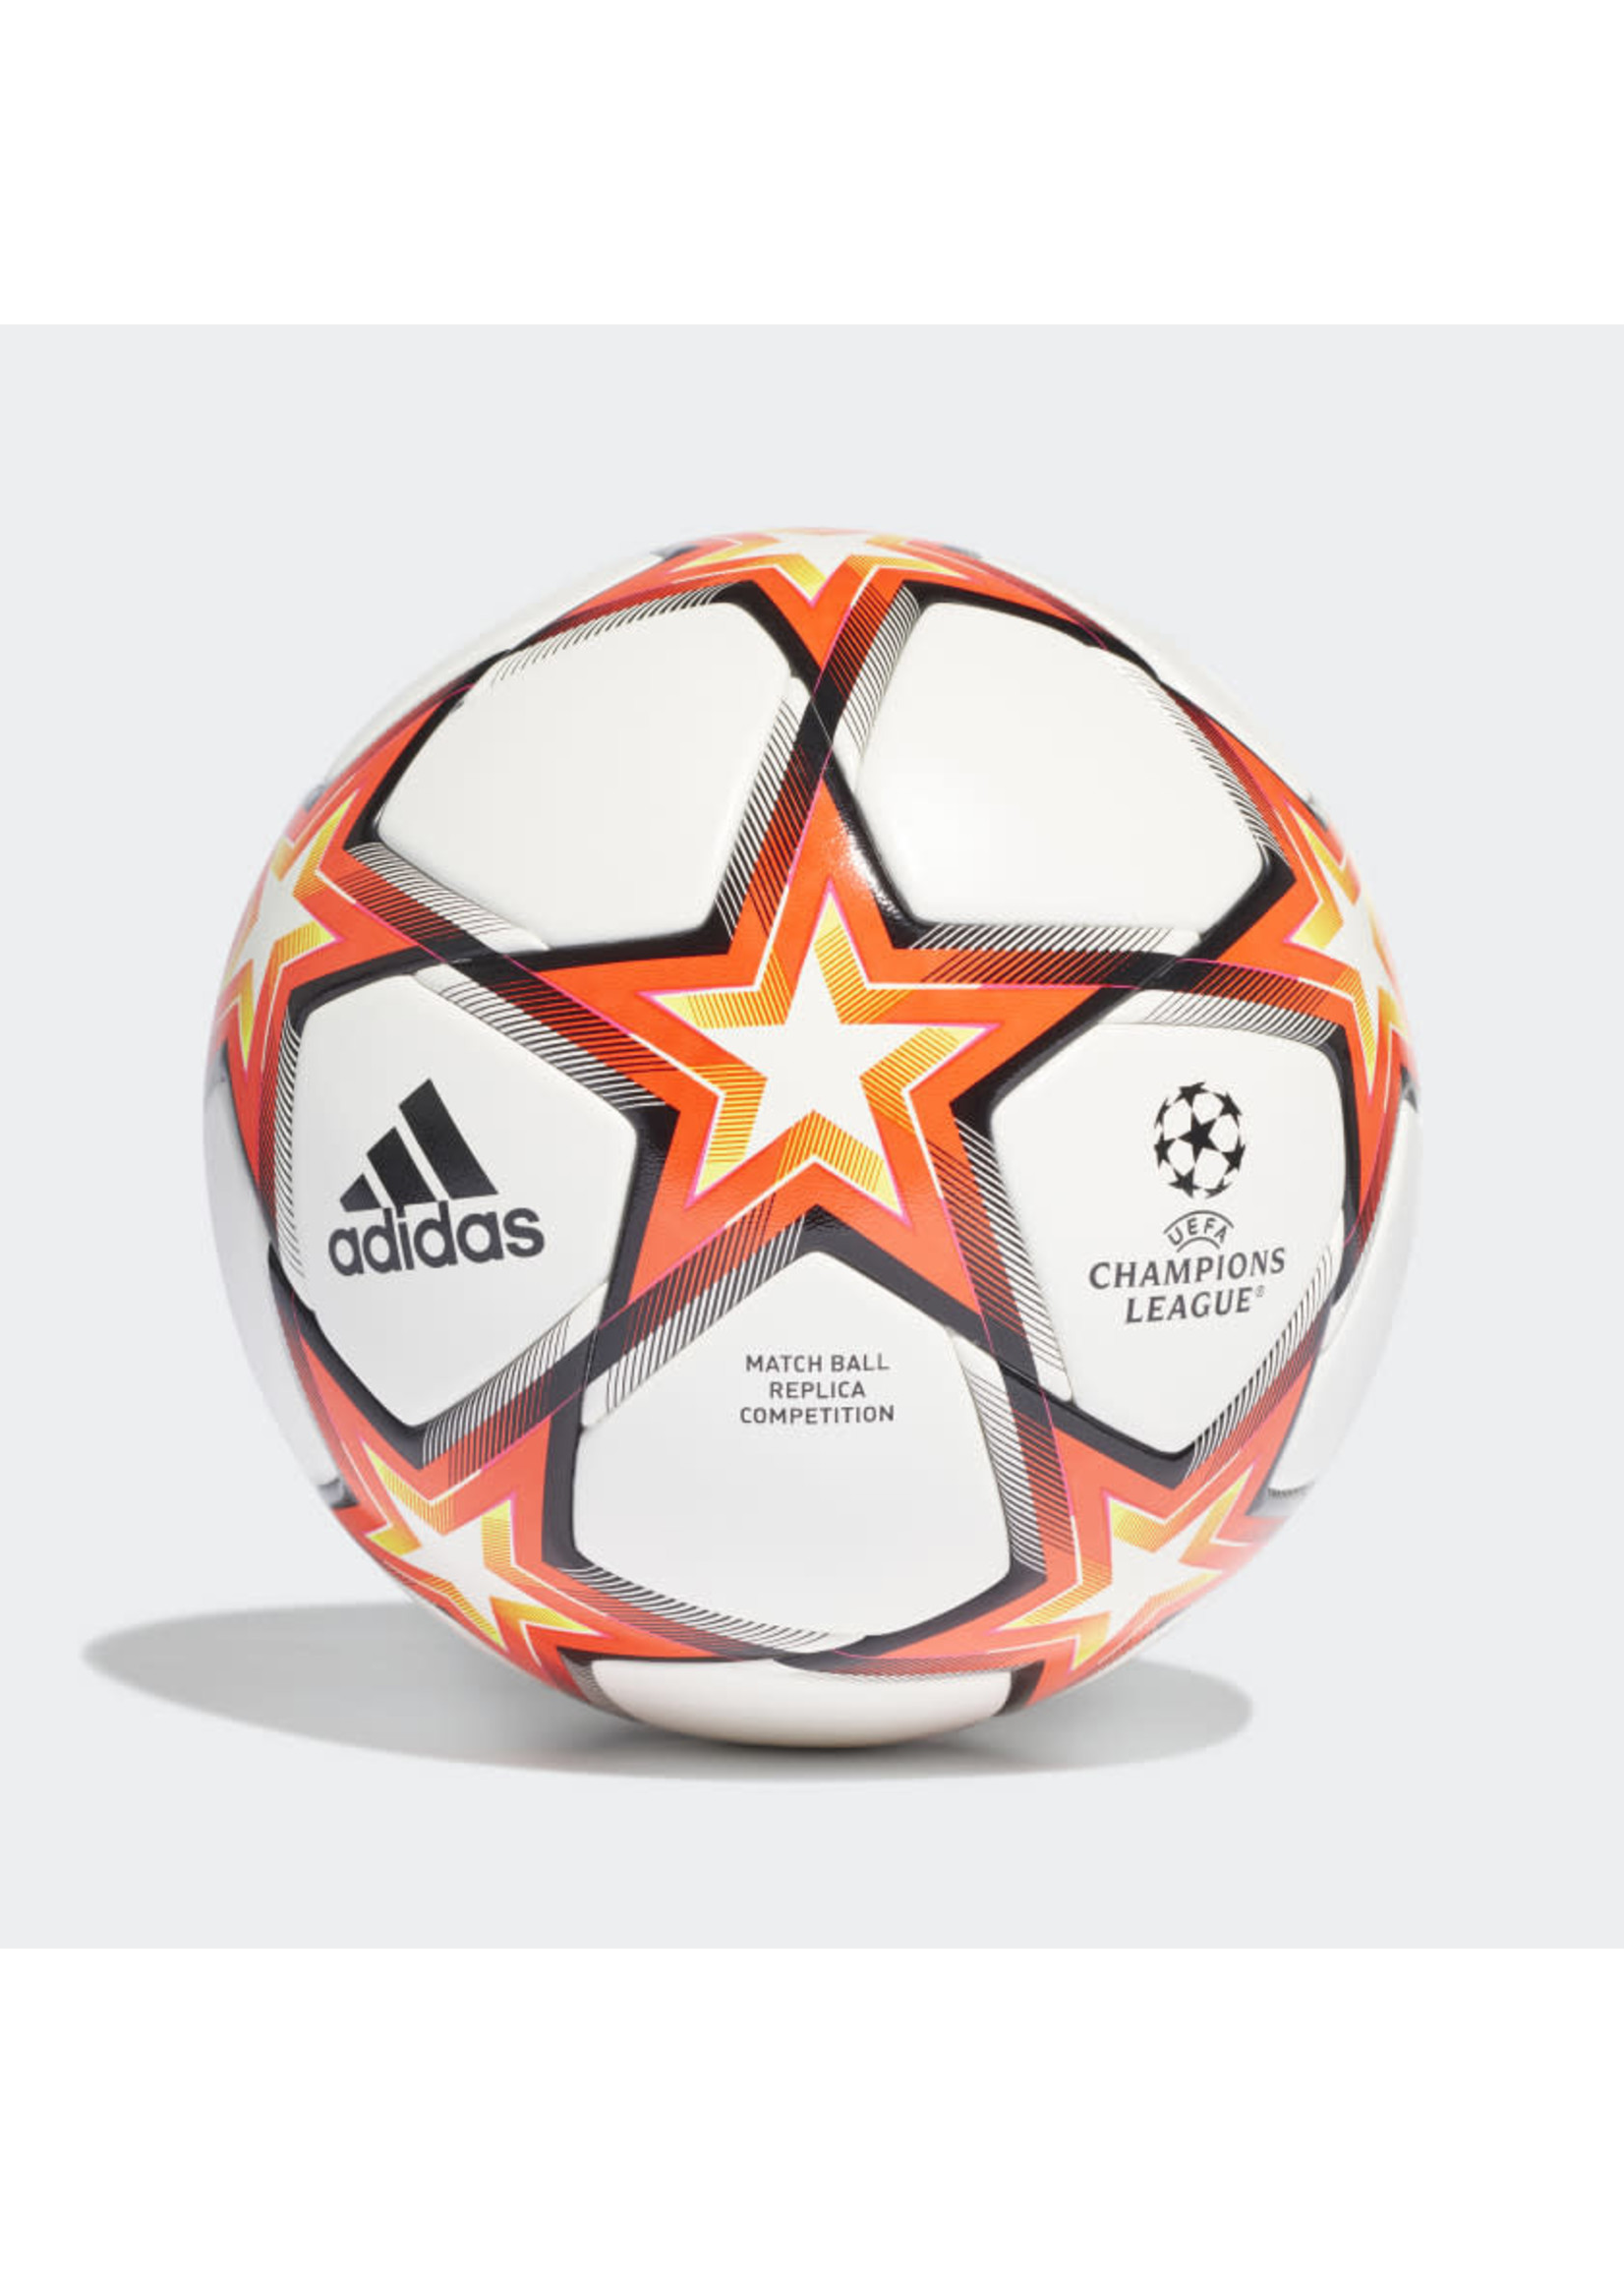 Adidas Champions League 21/22 Replica Match Ball